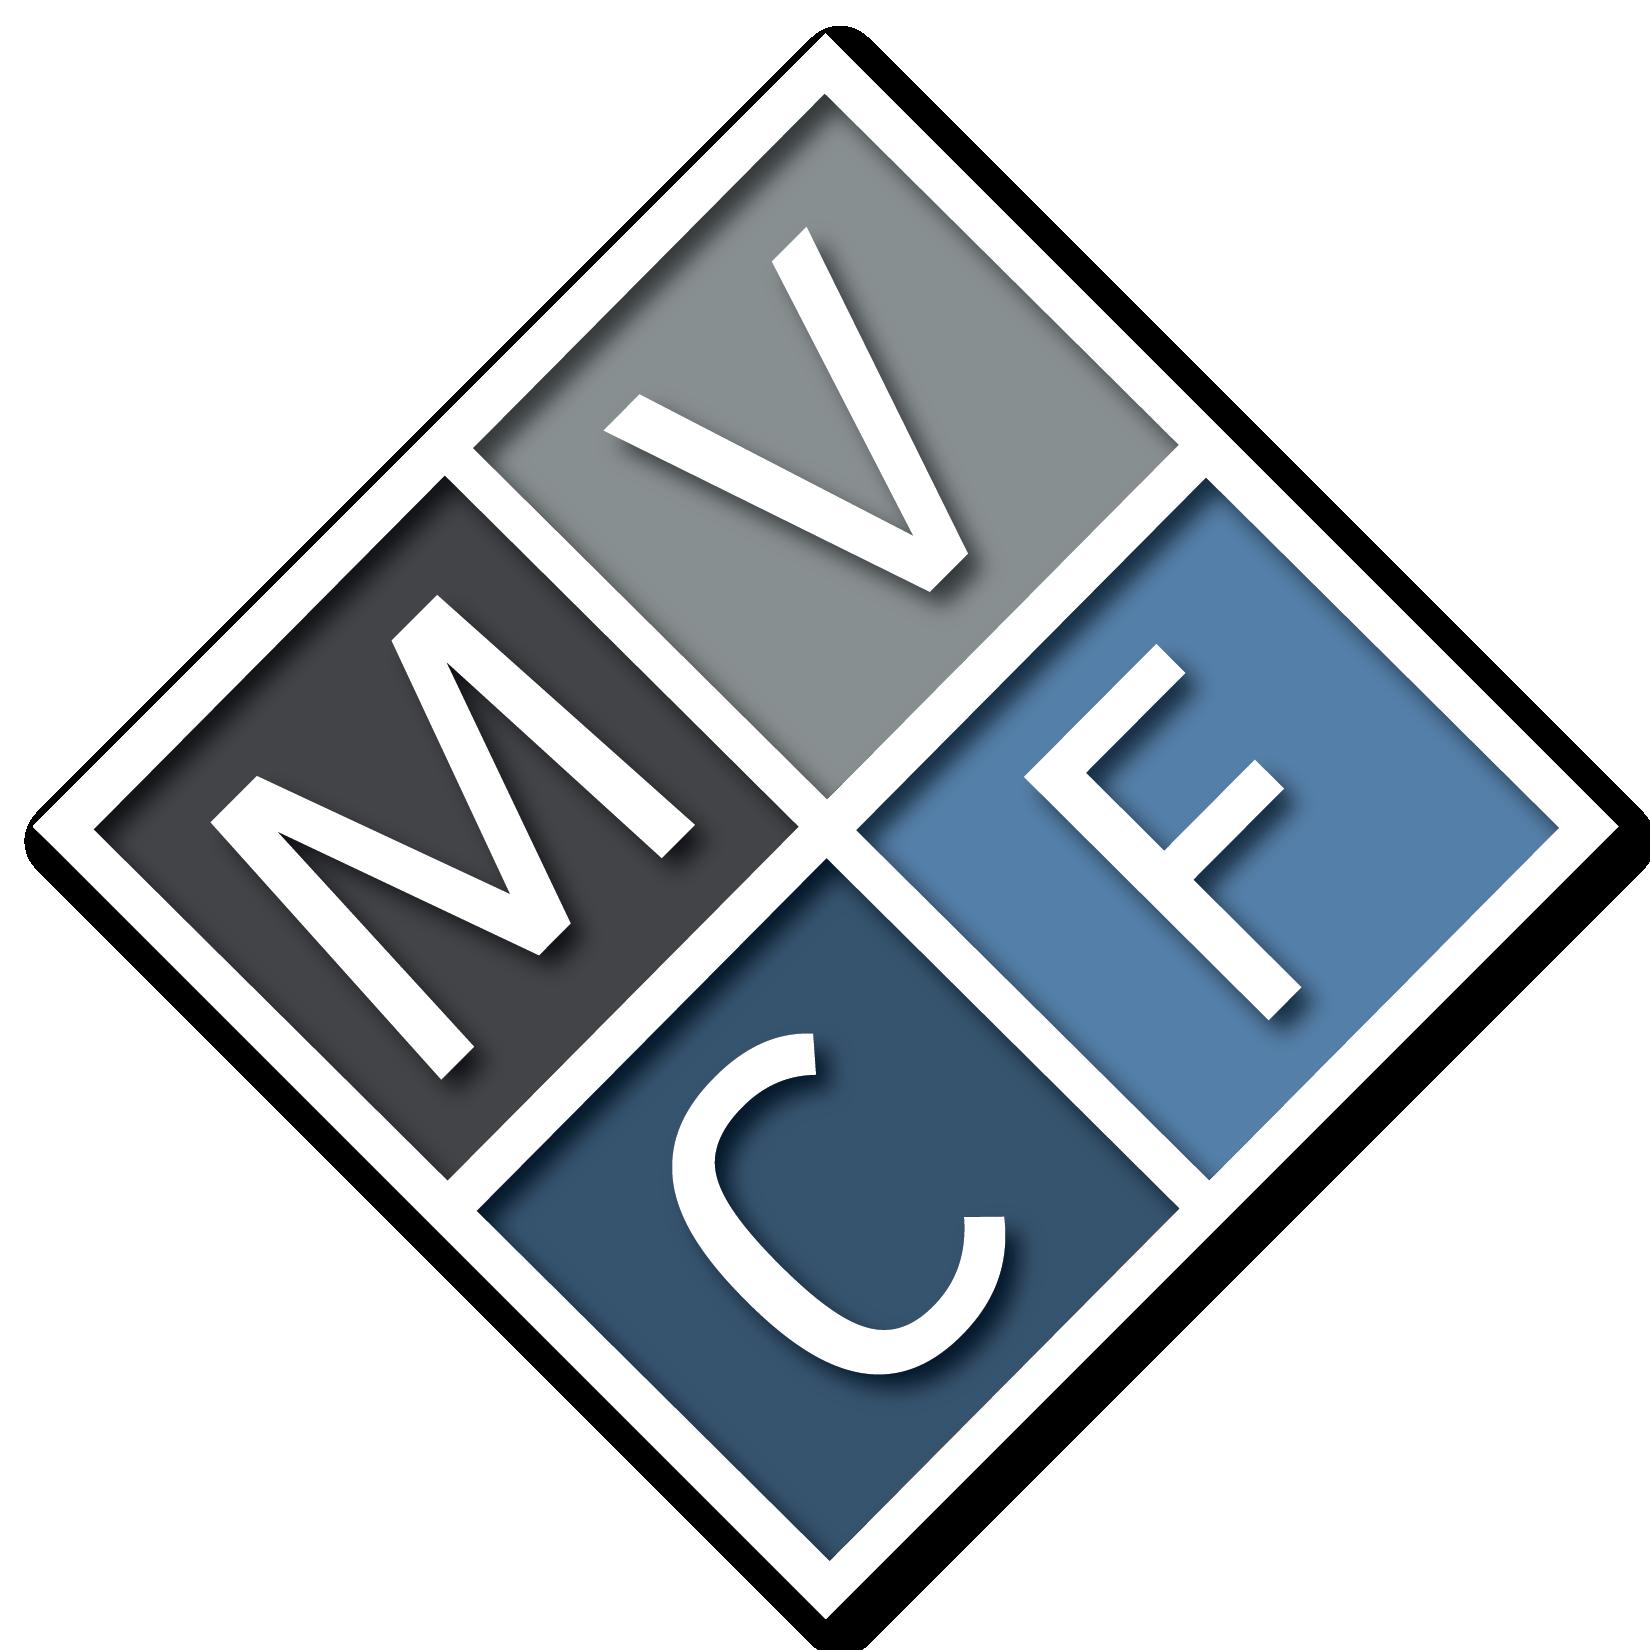 MVCF DIAMOND LOGO - SHADOW-01.png